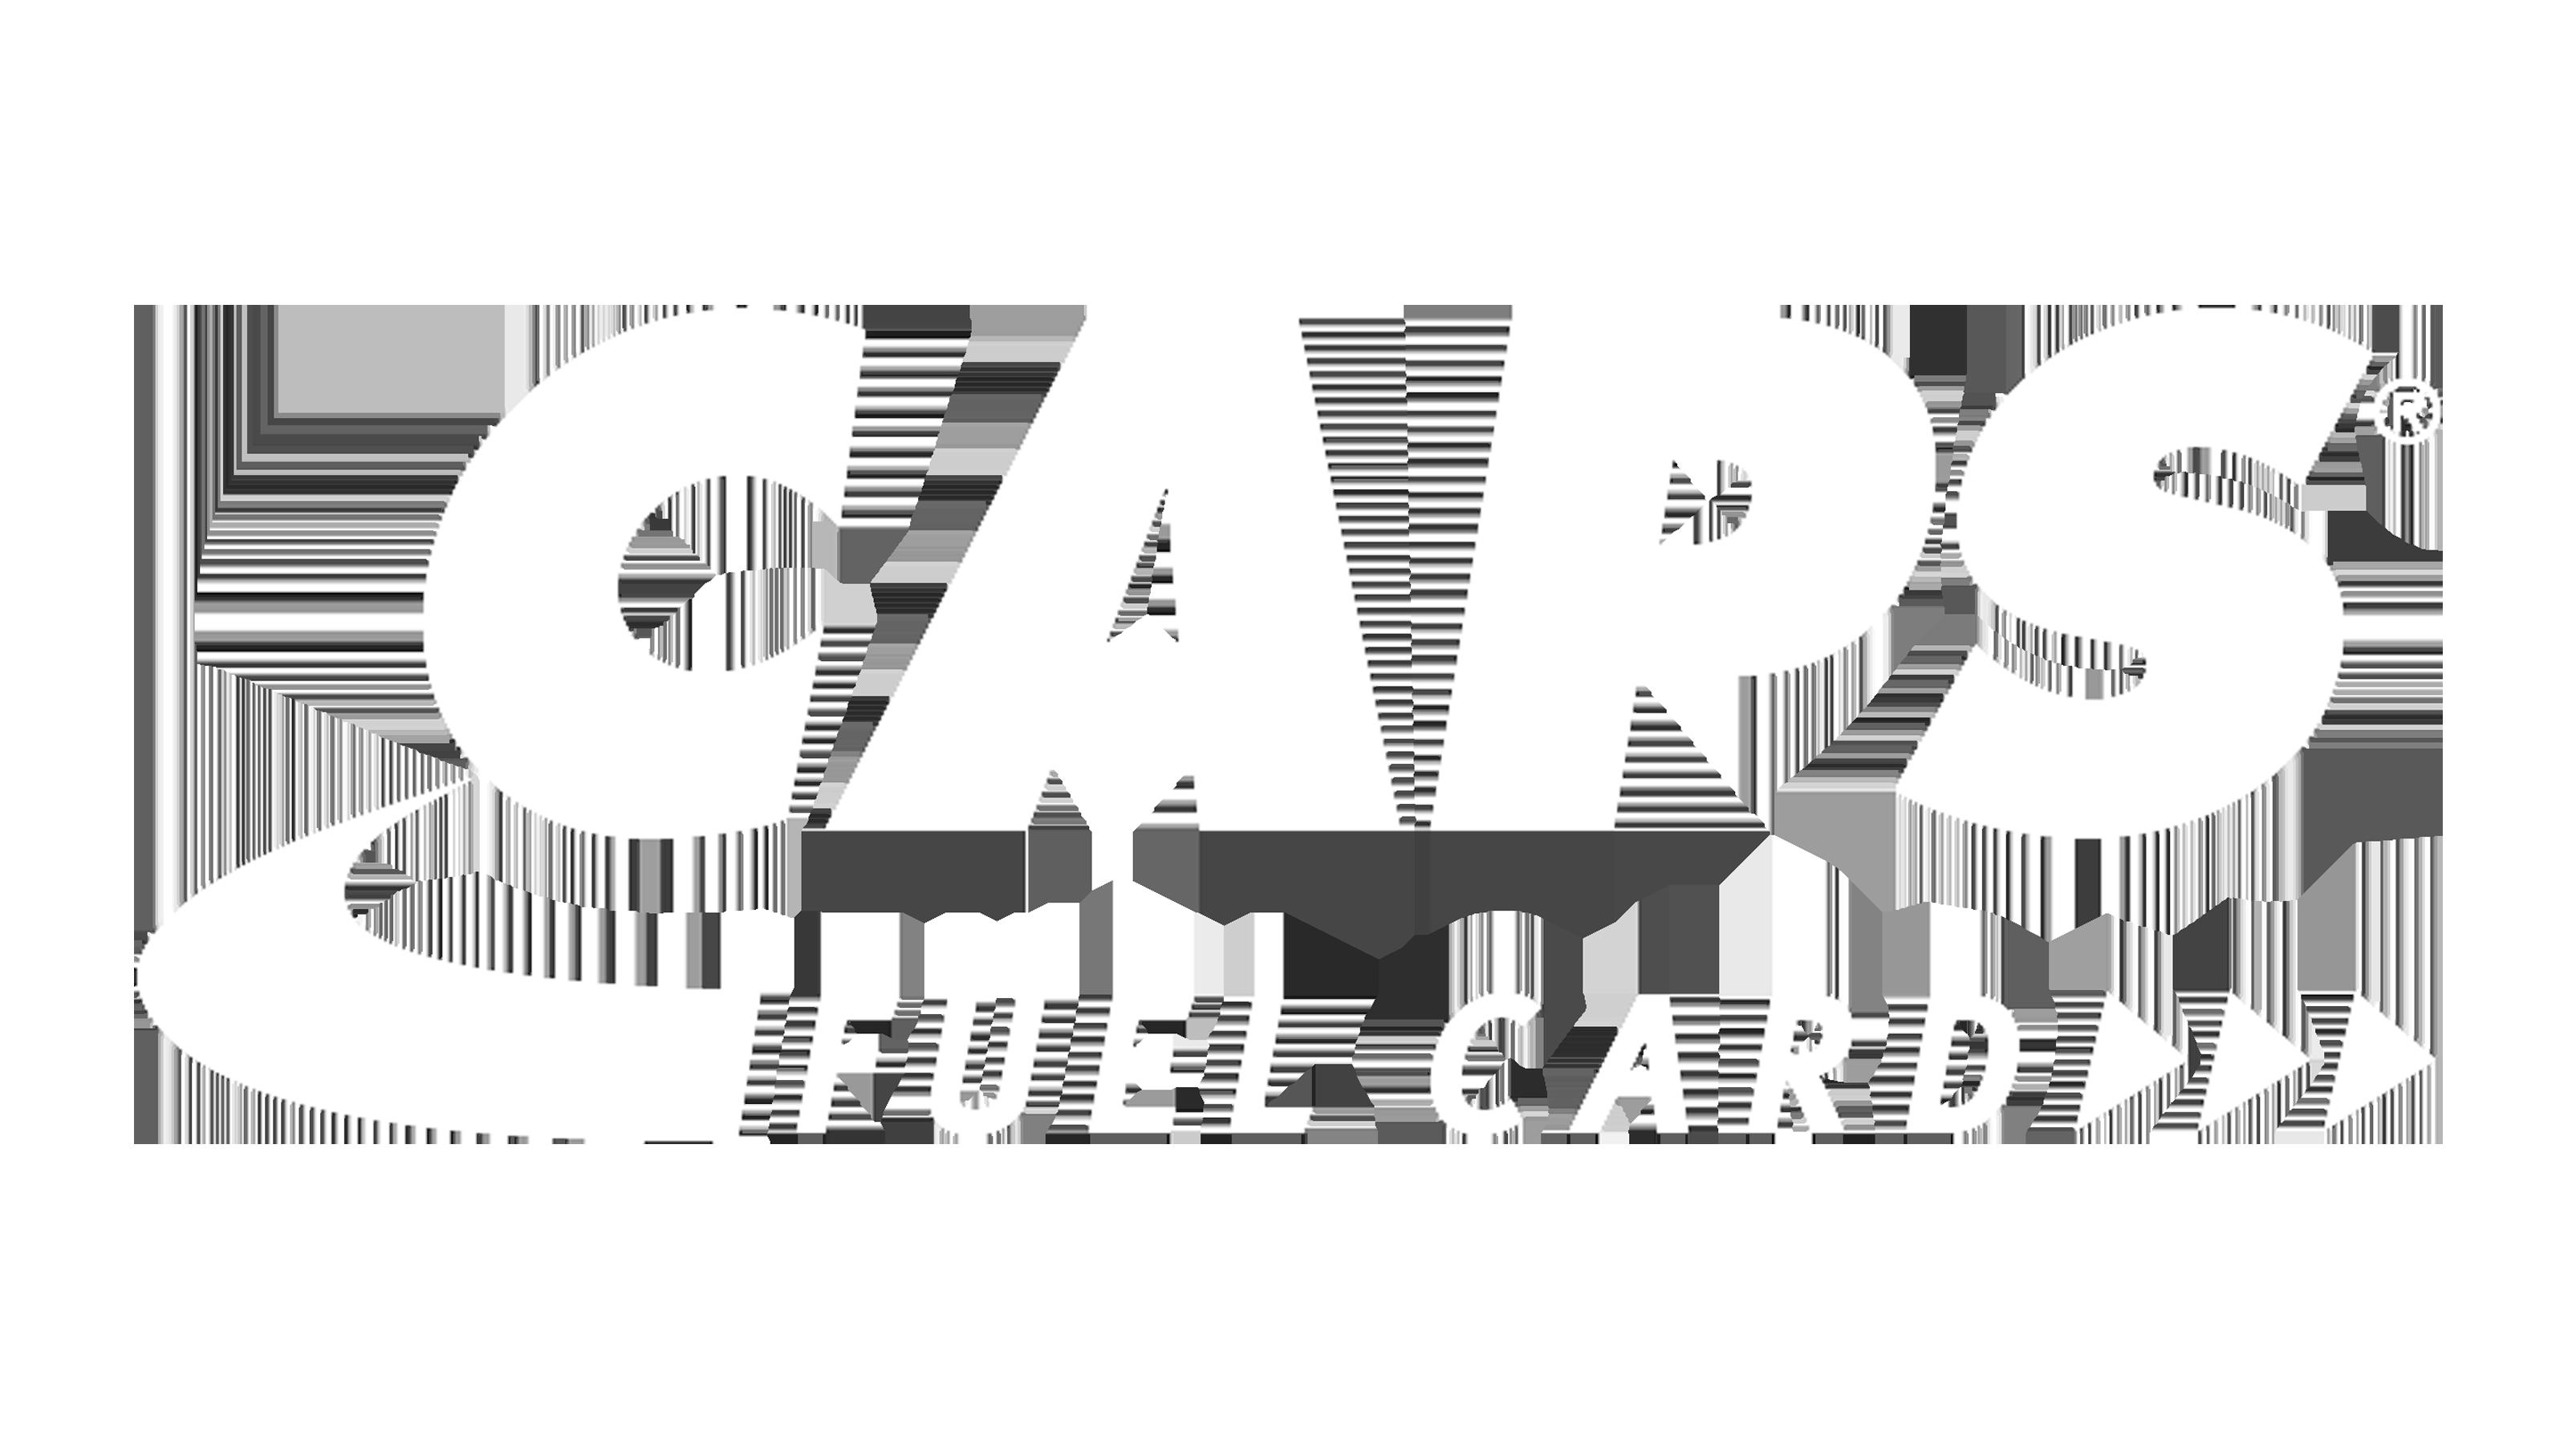 Caps Fuelcard